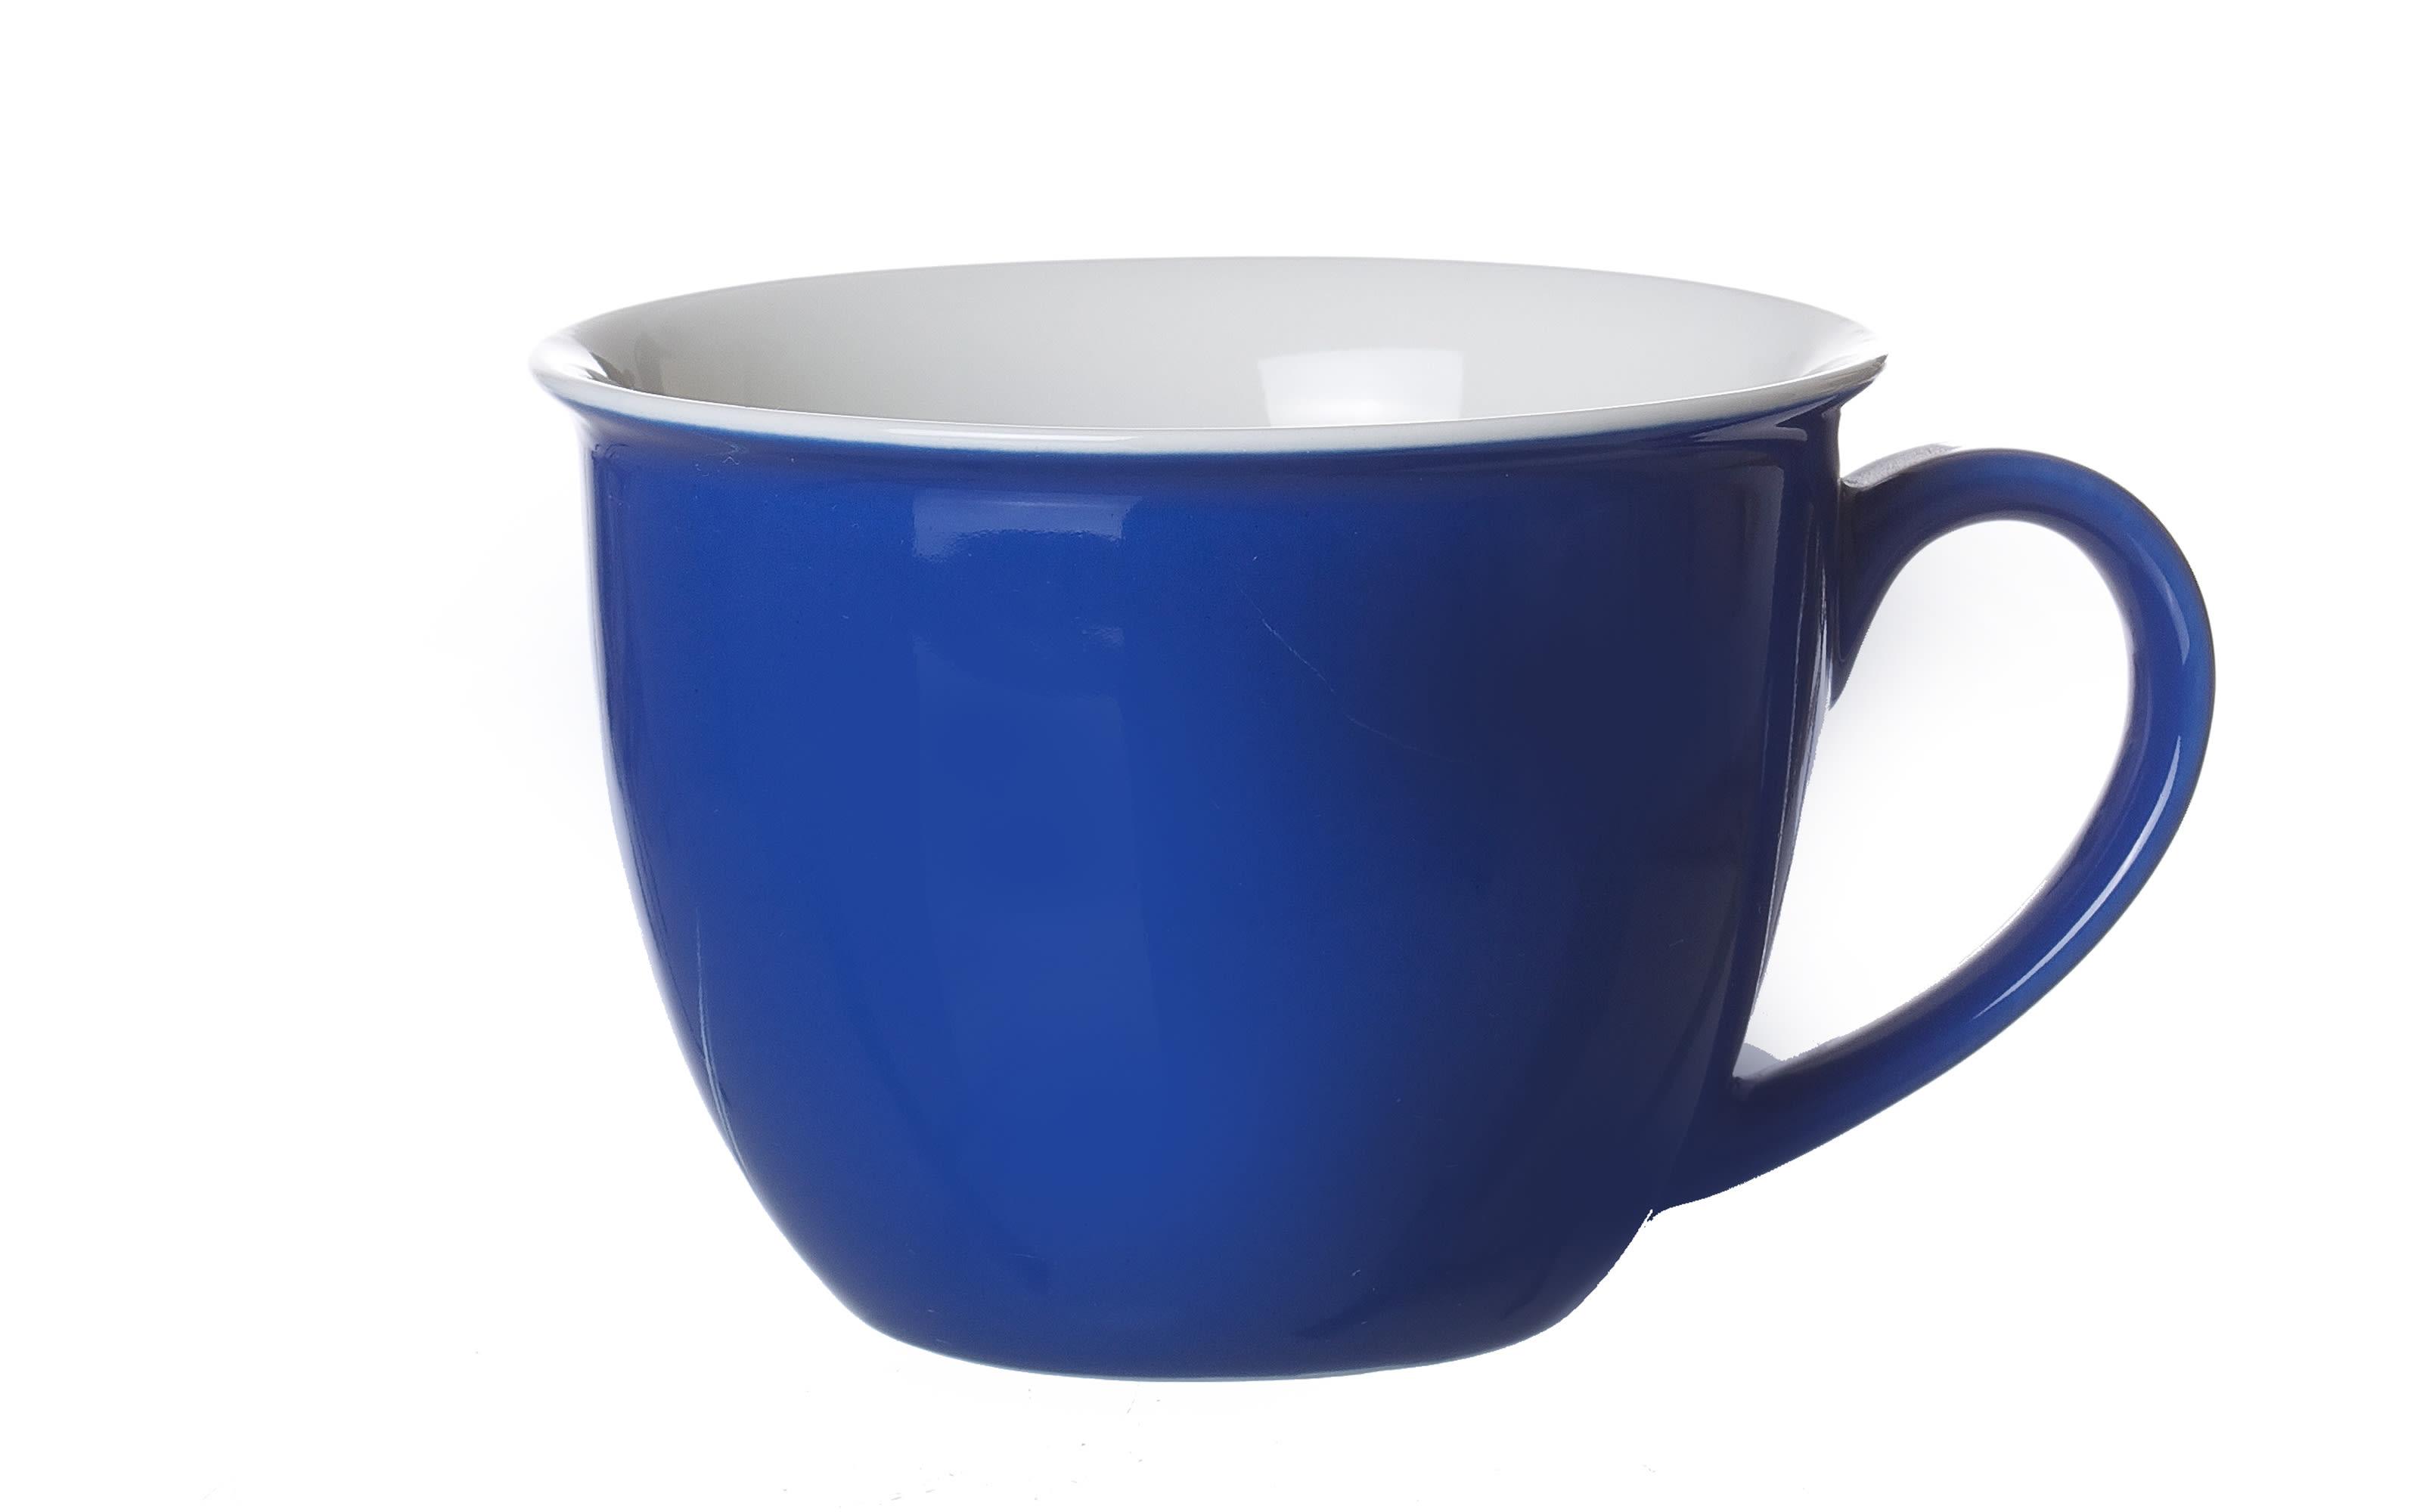 Jumbo Tasse Doppio in indigo, 350 ml